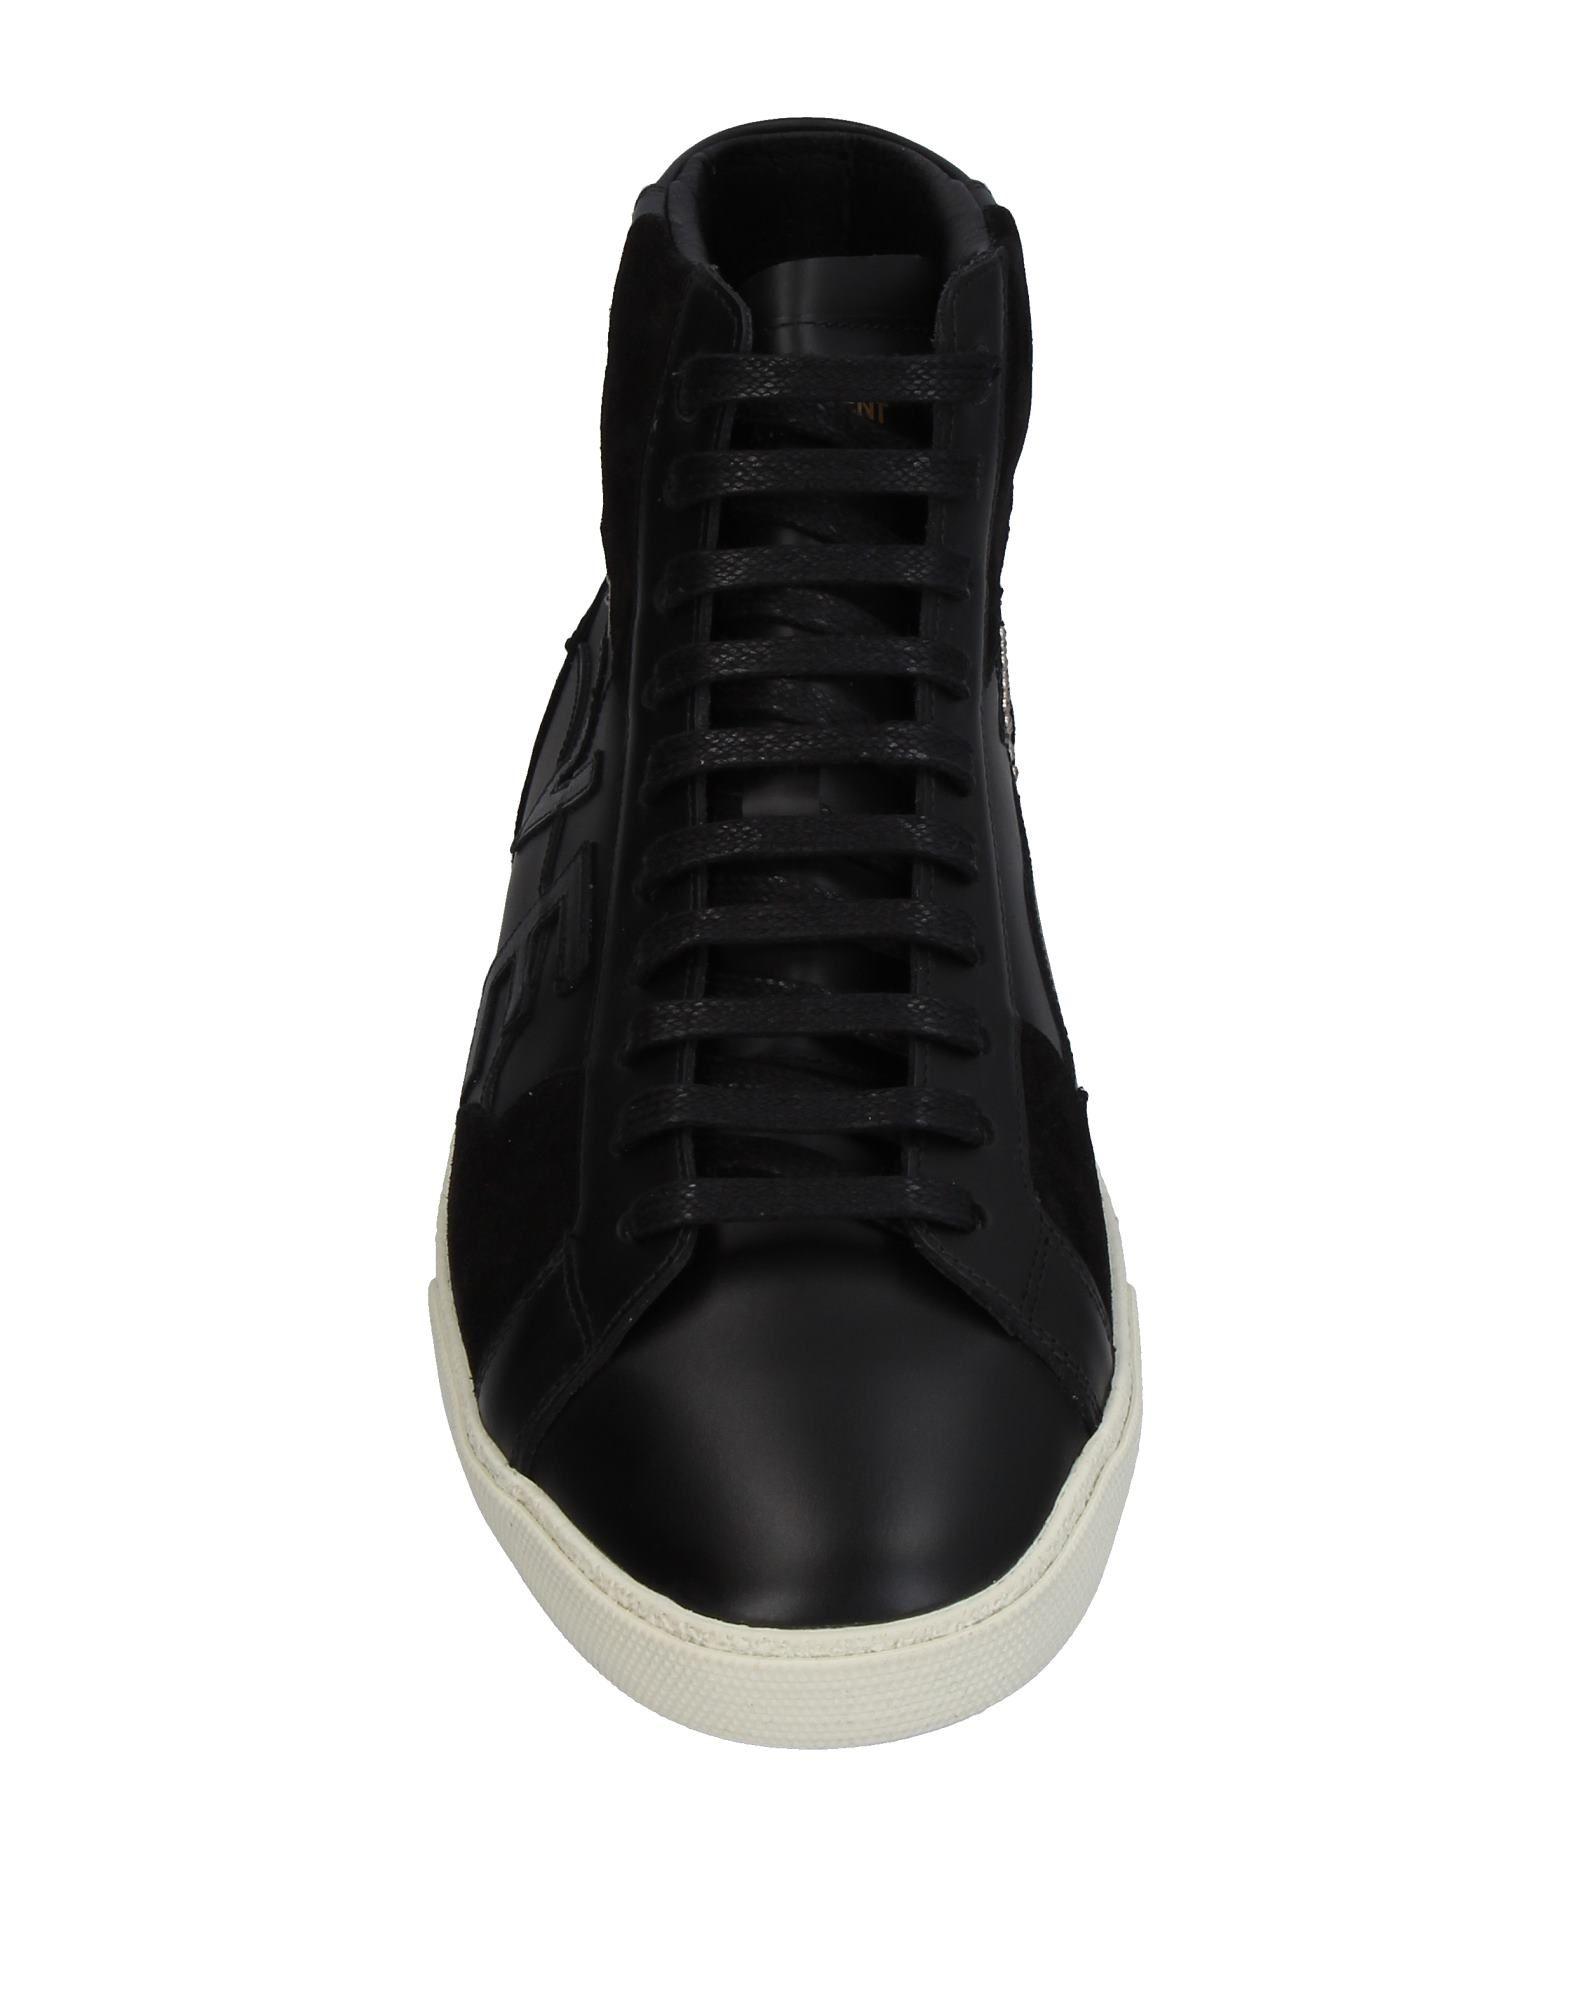 Sneakers Saint Laurent Homme - Sneakers Saint Laurent sur